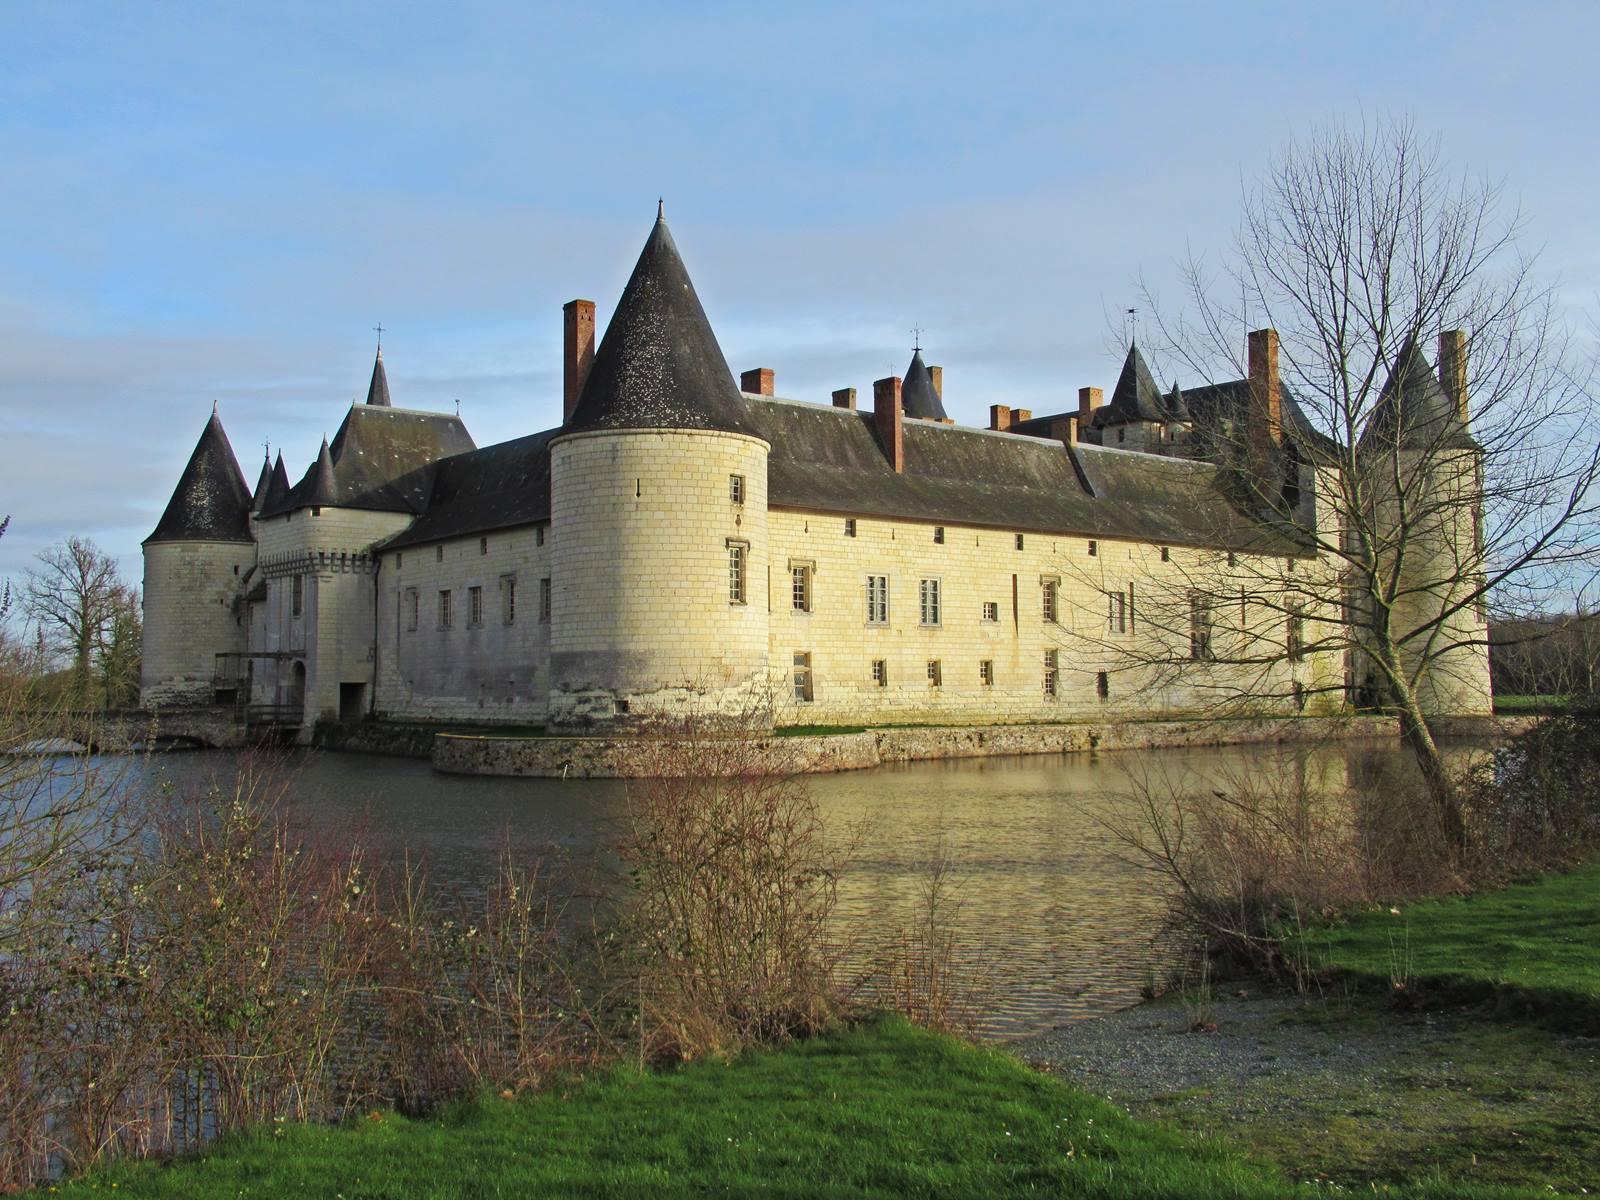 Chateau plessis bourre maine loire tourismechateau du plessis bourre maine loire 28